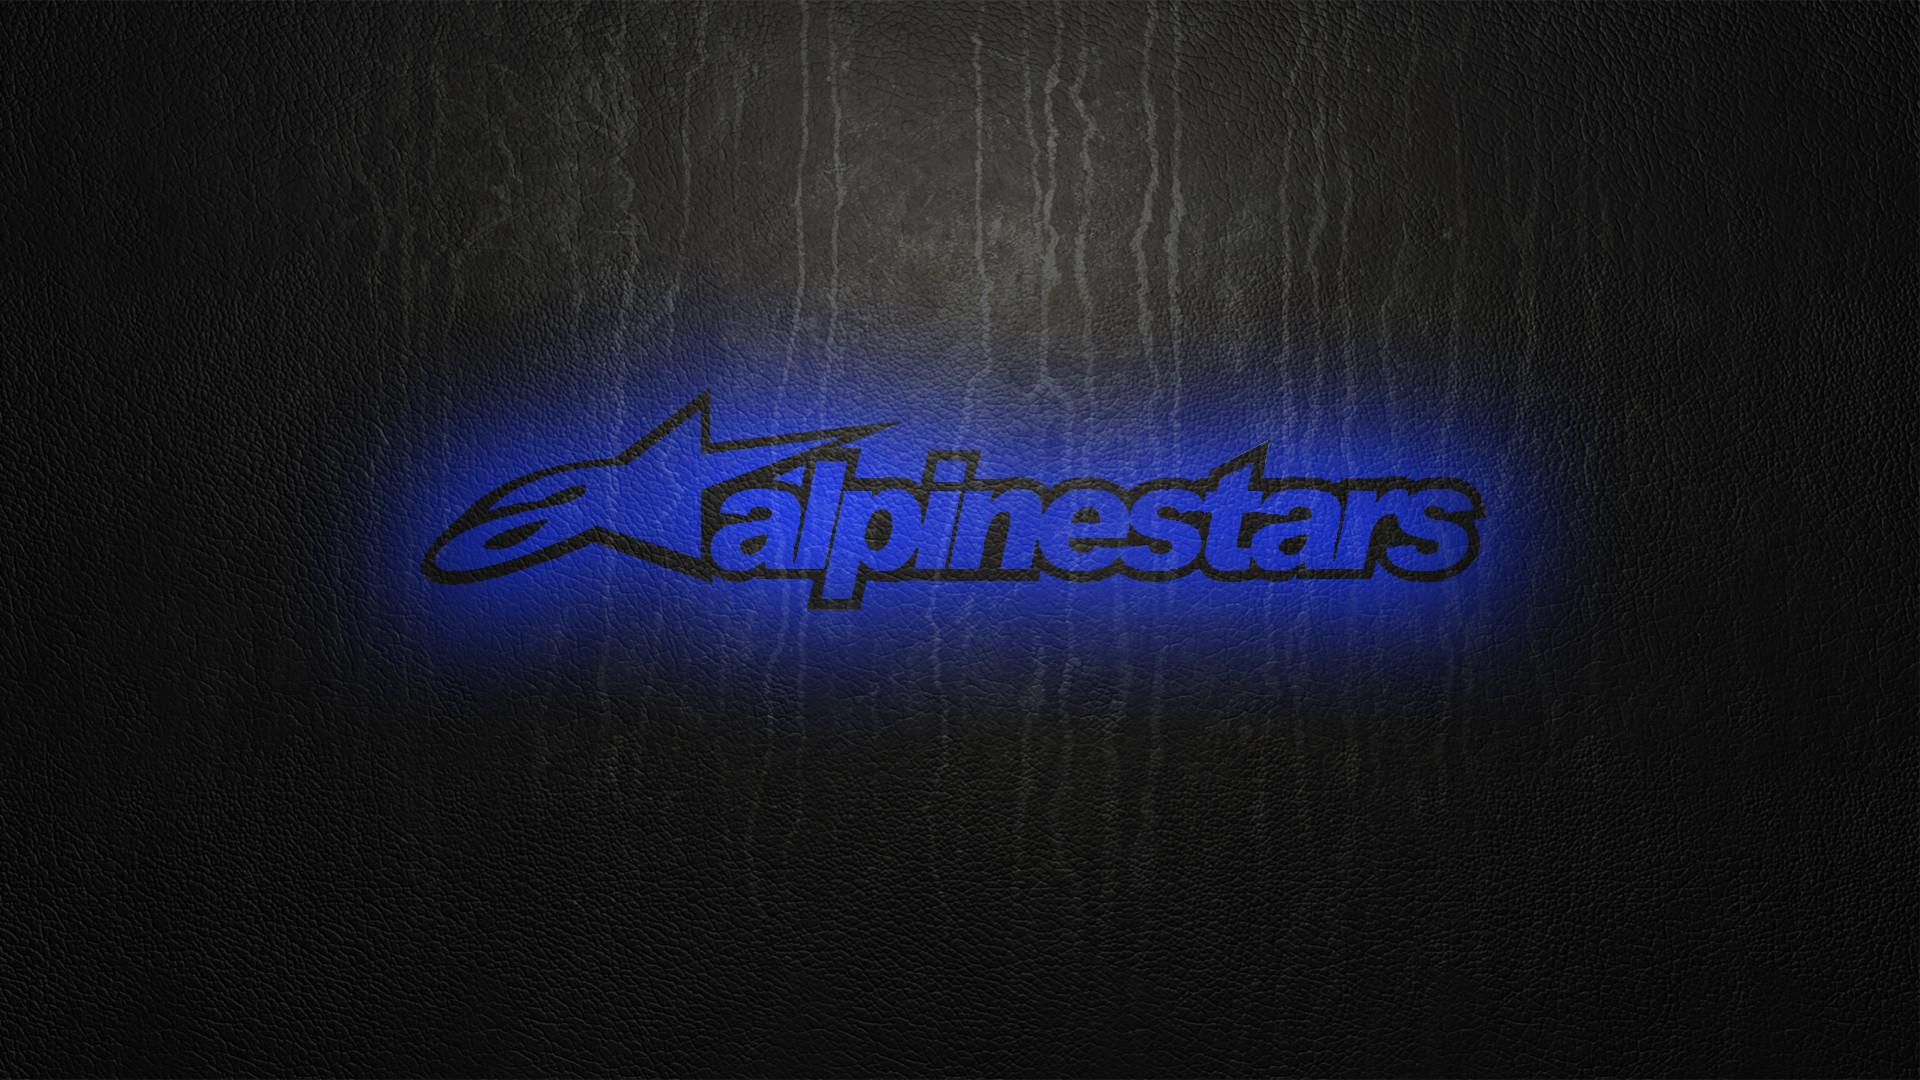 Alpinestars Wallpapers 1920x1080